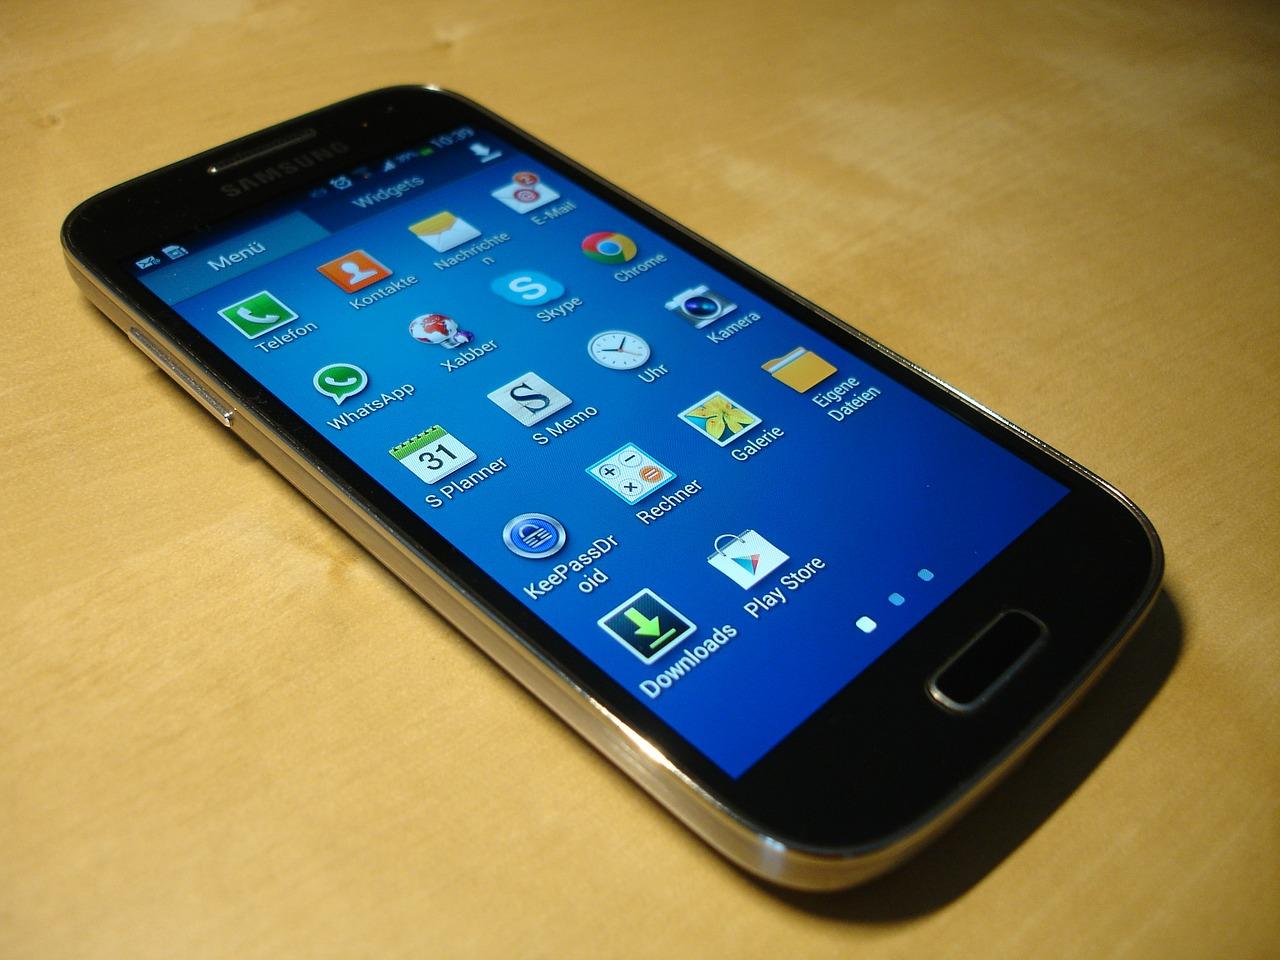 Konfiguration Handy|Smartphones|Tablet PCs| iOS & Android